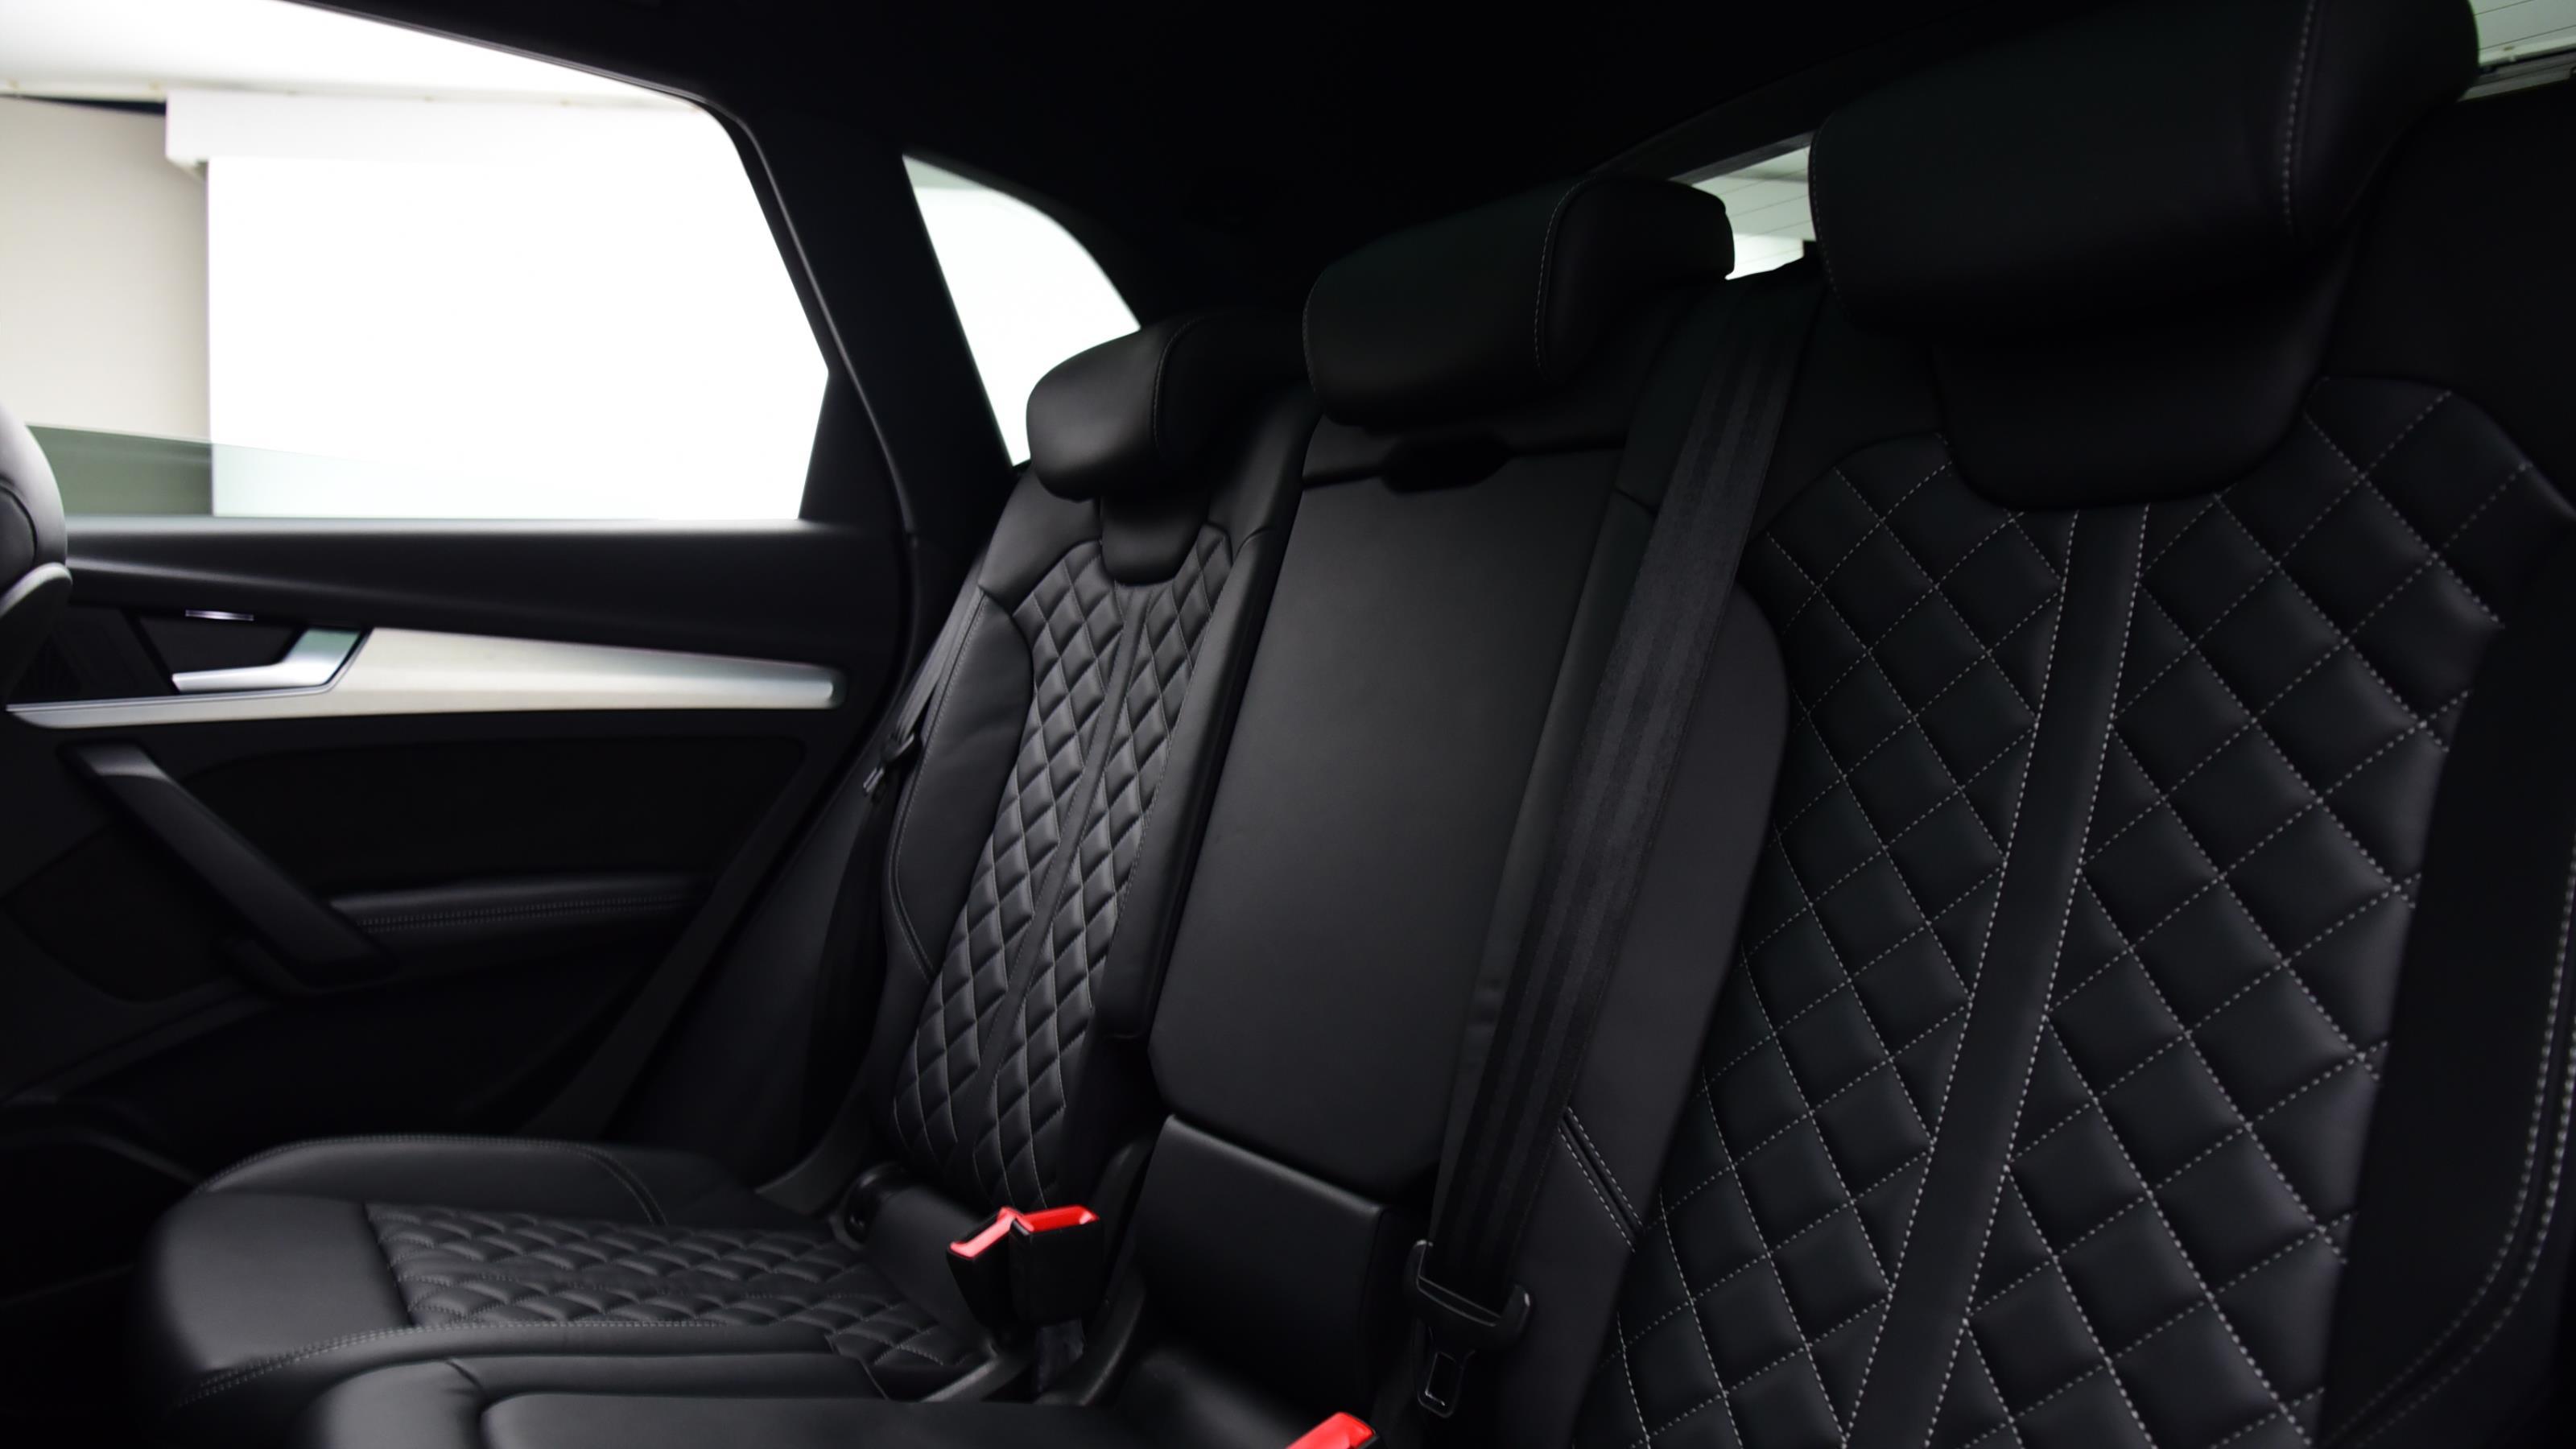 Used 2017 Audi Q5 SQ5 Quattro 5dr Tip Auto BLUE at Saxton4x4